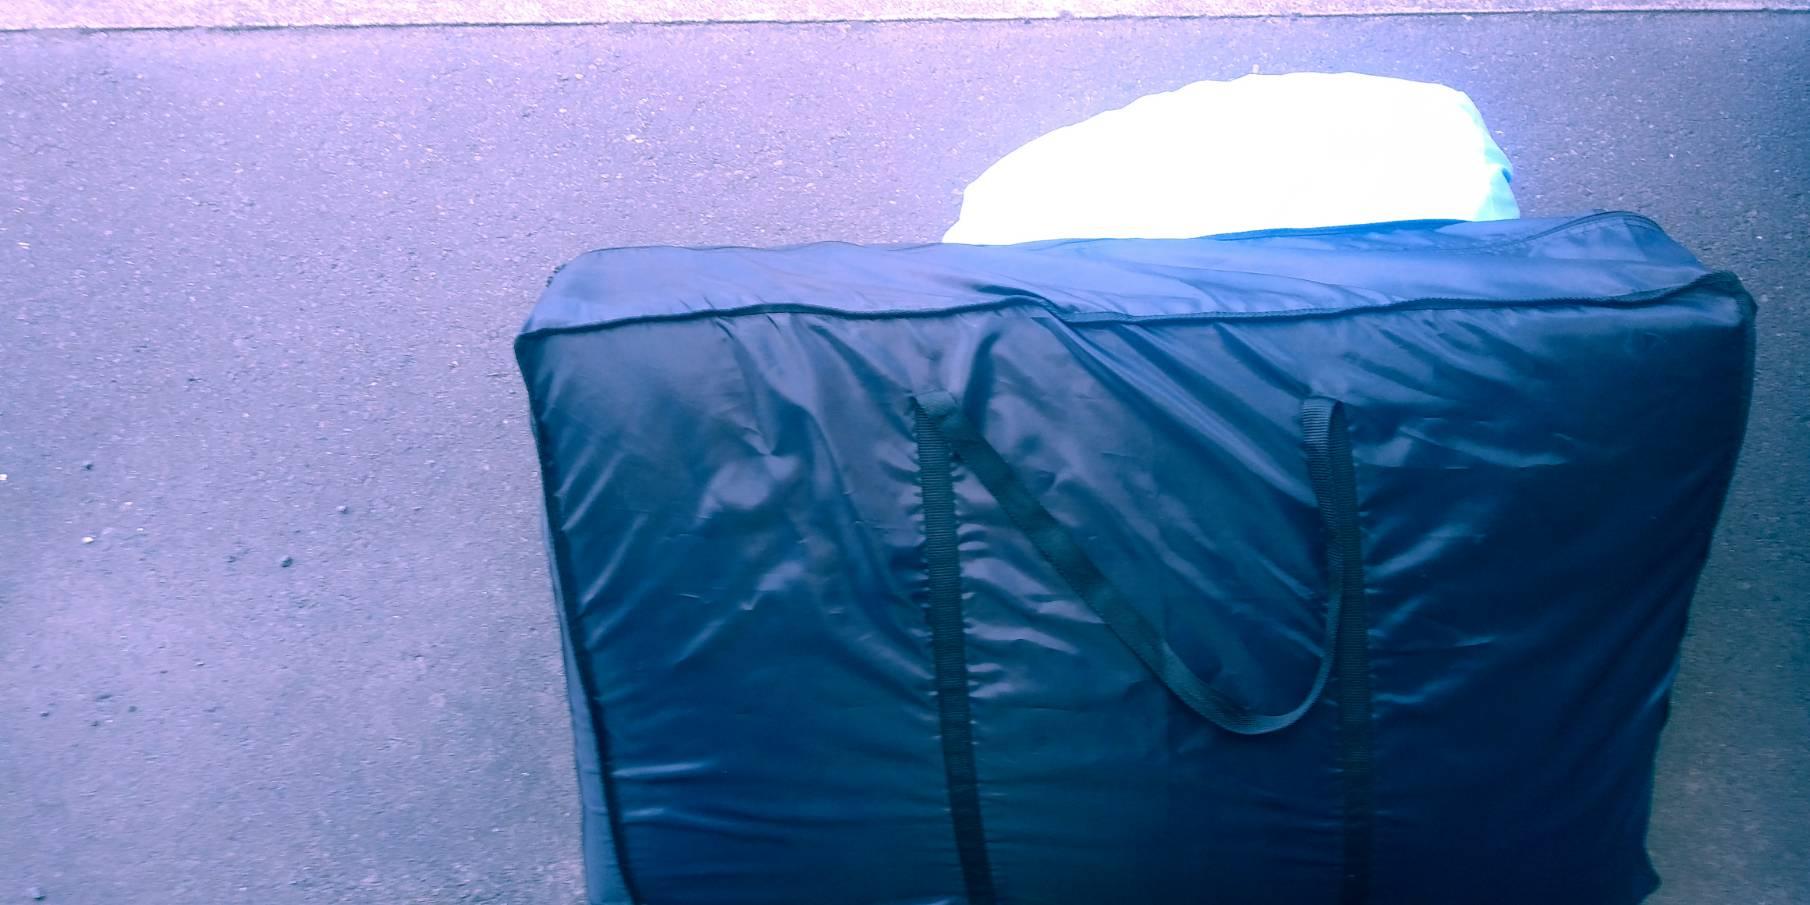 布団、毛布の回収前